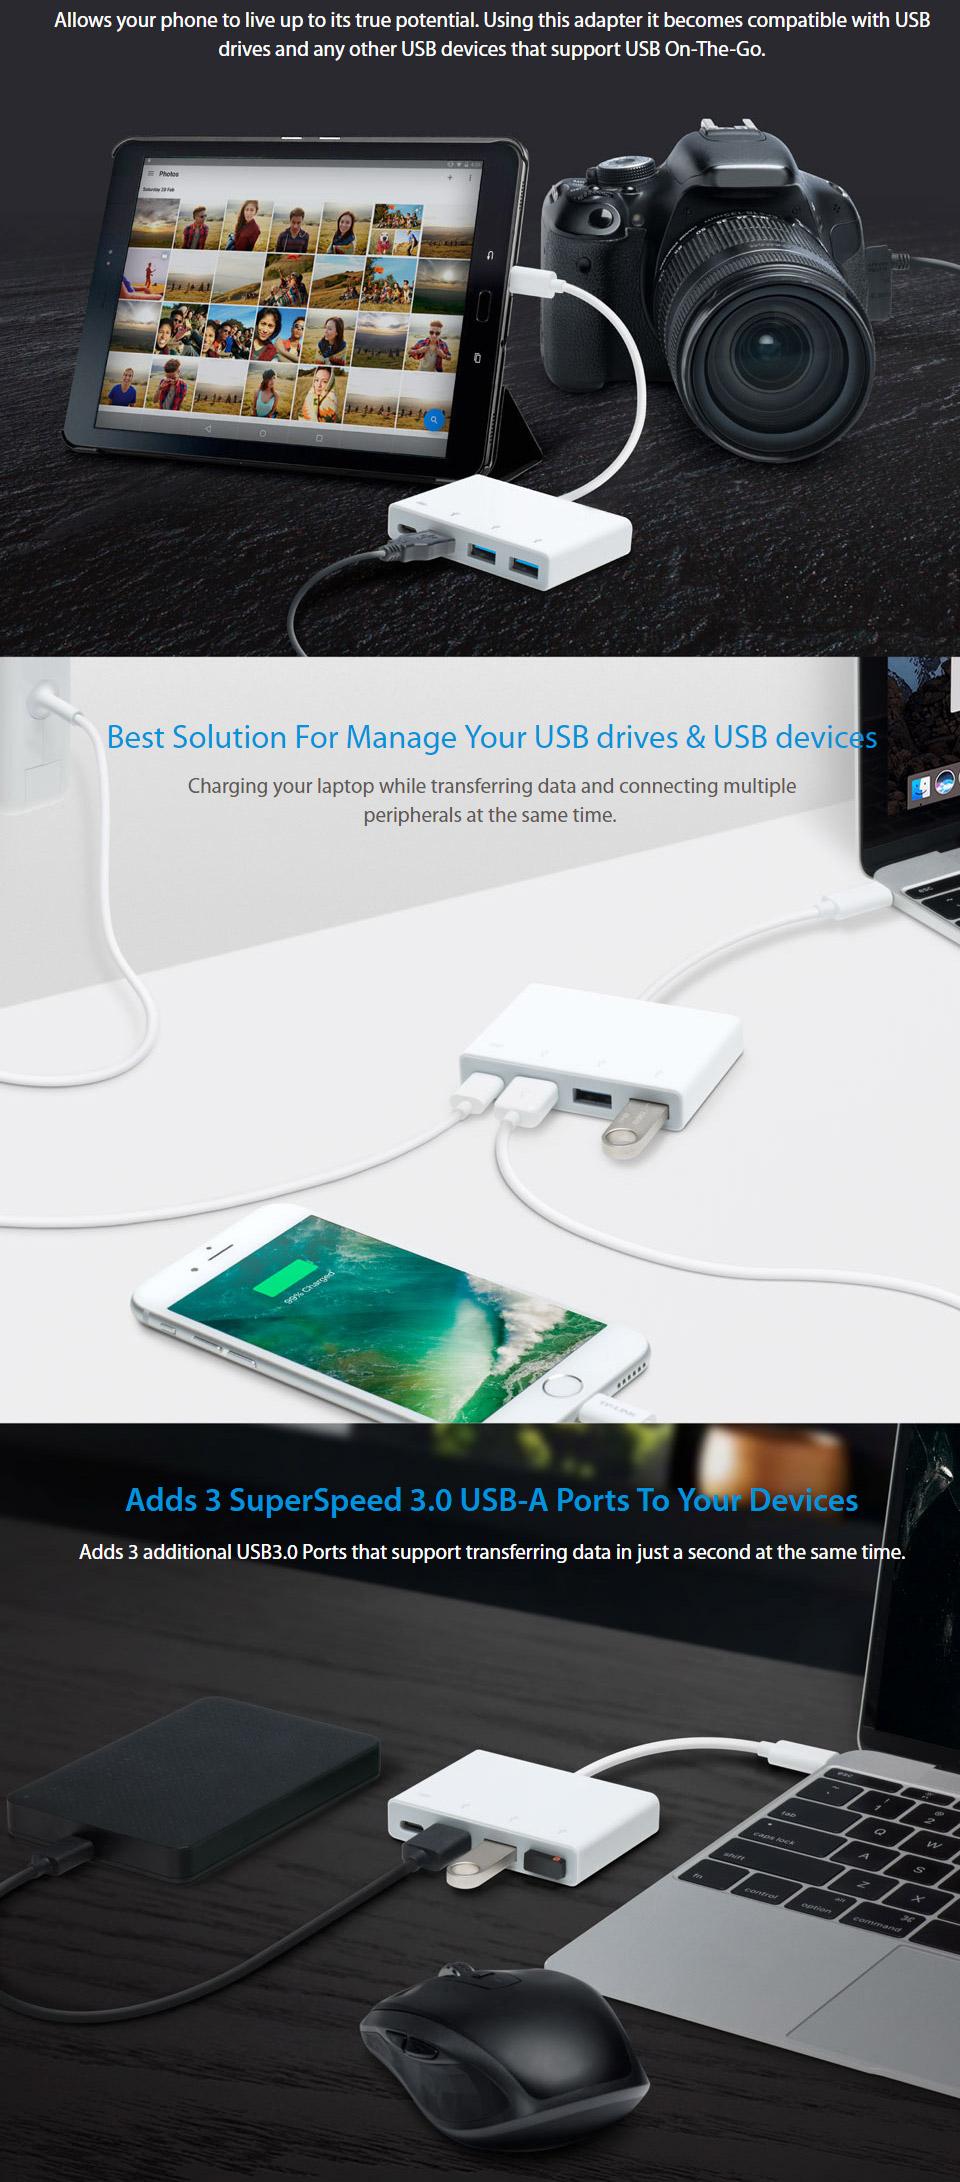 TP-Link UC430 Ultra Compact 3 0 USB-C 4-Port Hub [TL-UC430